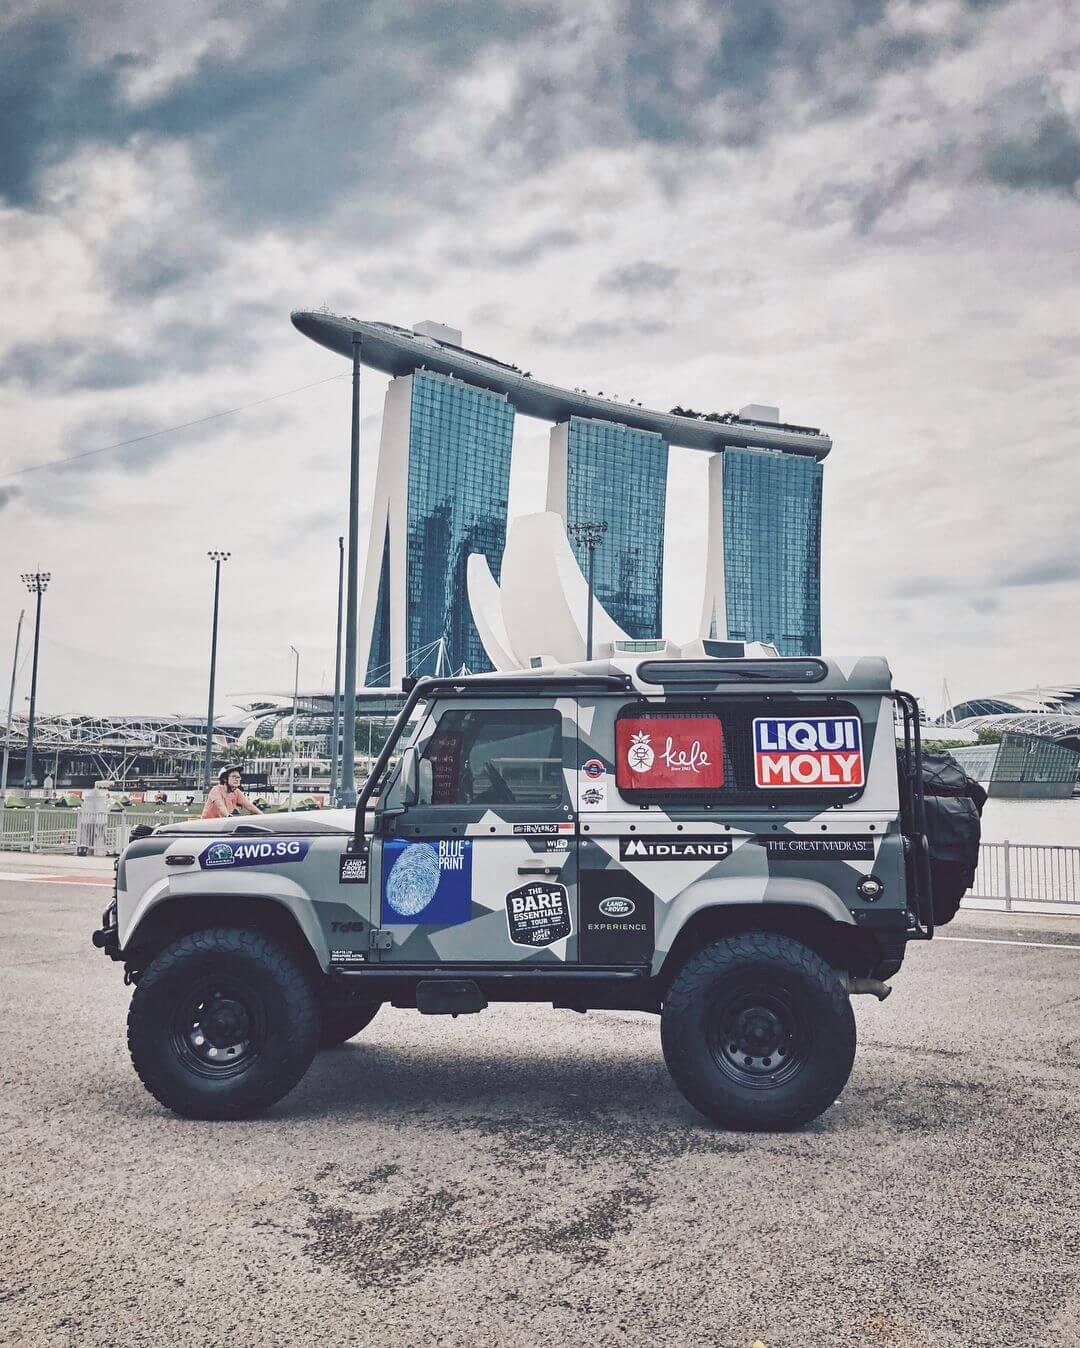 Land Rover Club of Singapore